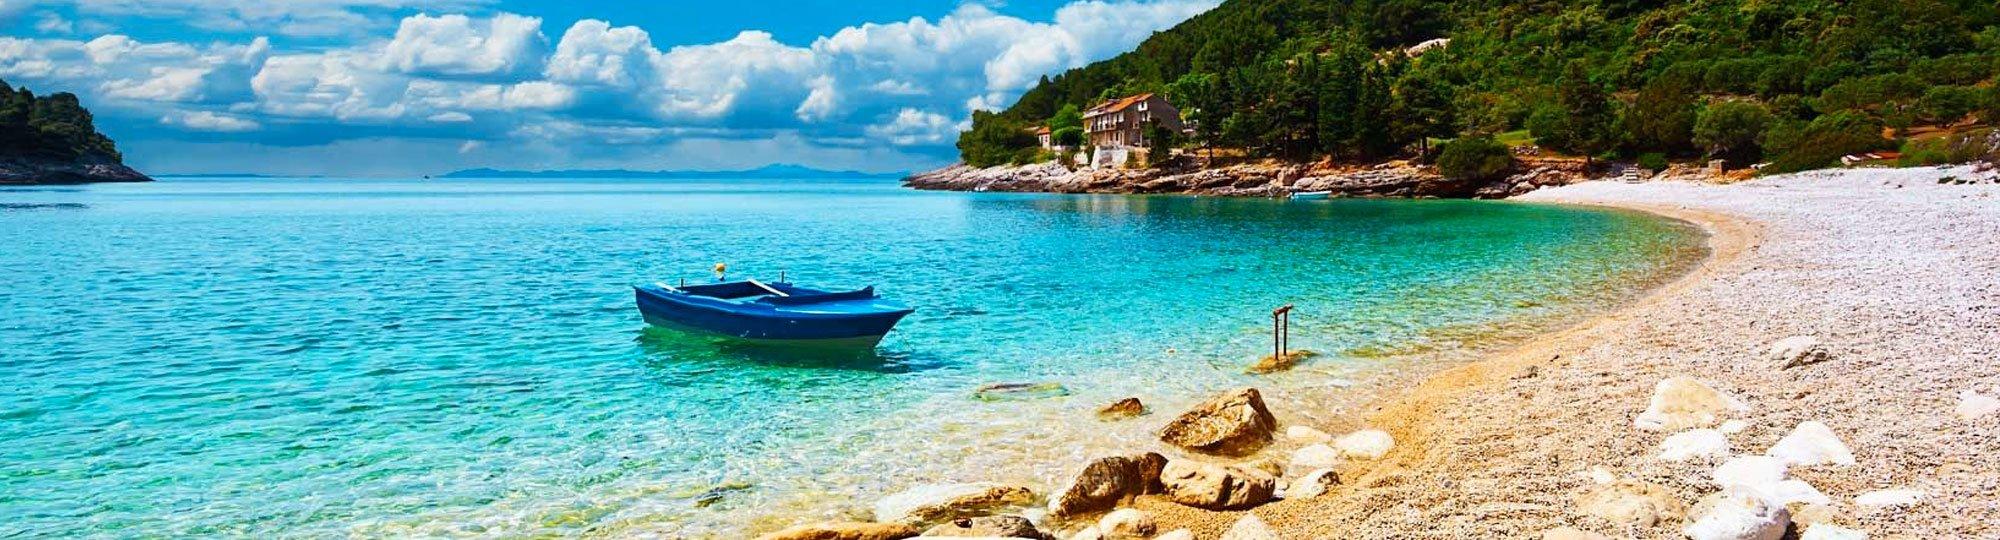 Croatia, Slovenia &Vienna - 10 Days Holiday Package - Tour